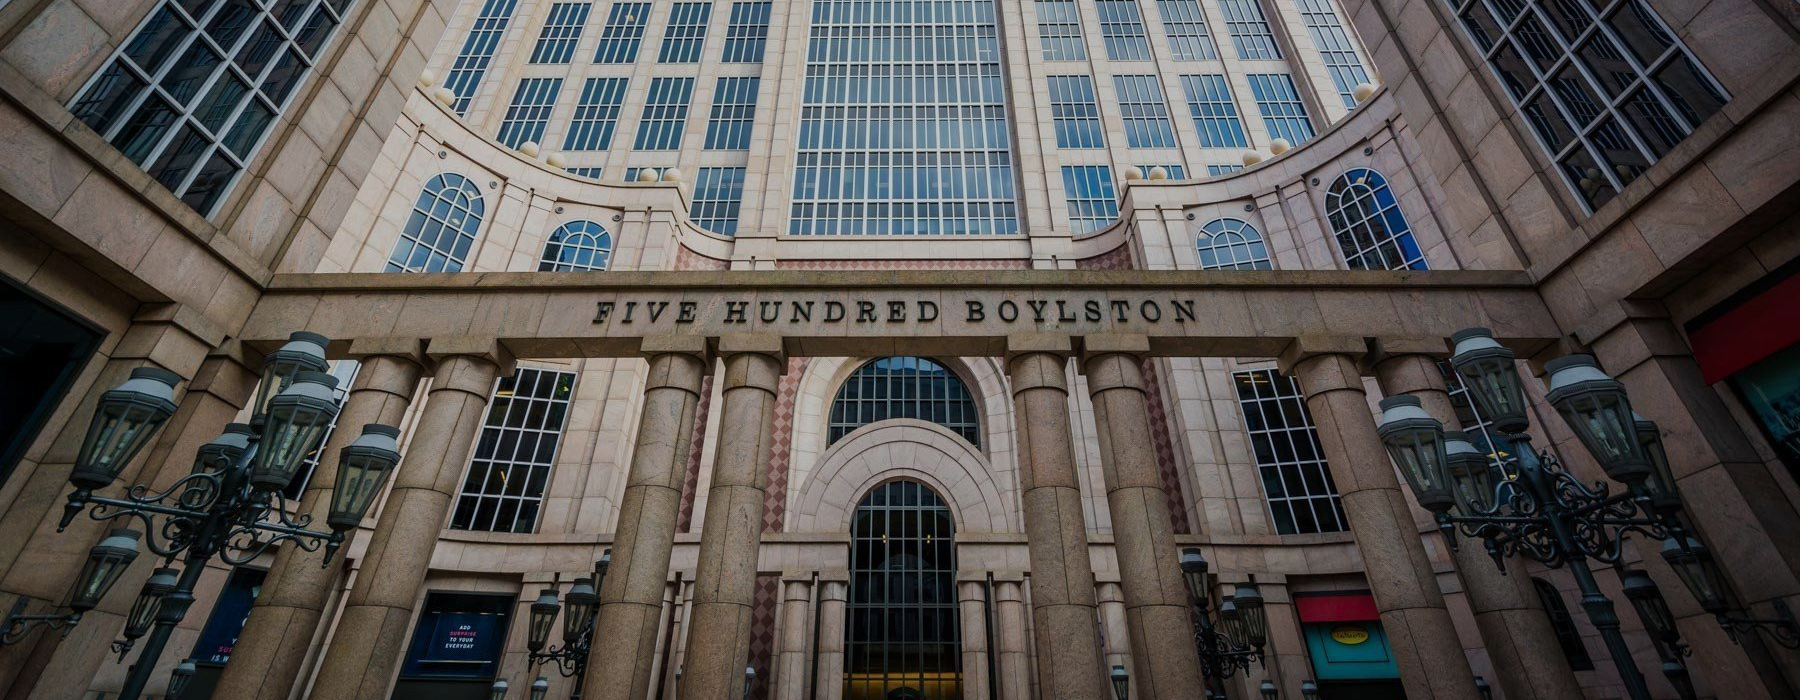 500 Boylston Street Boston Front Entrance